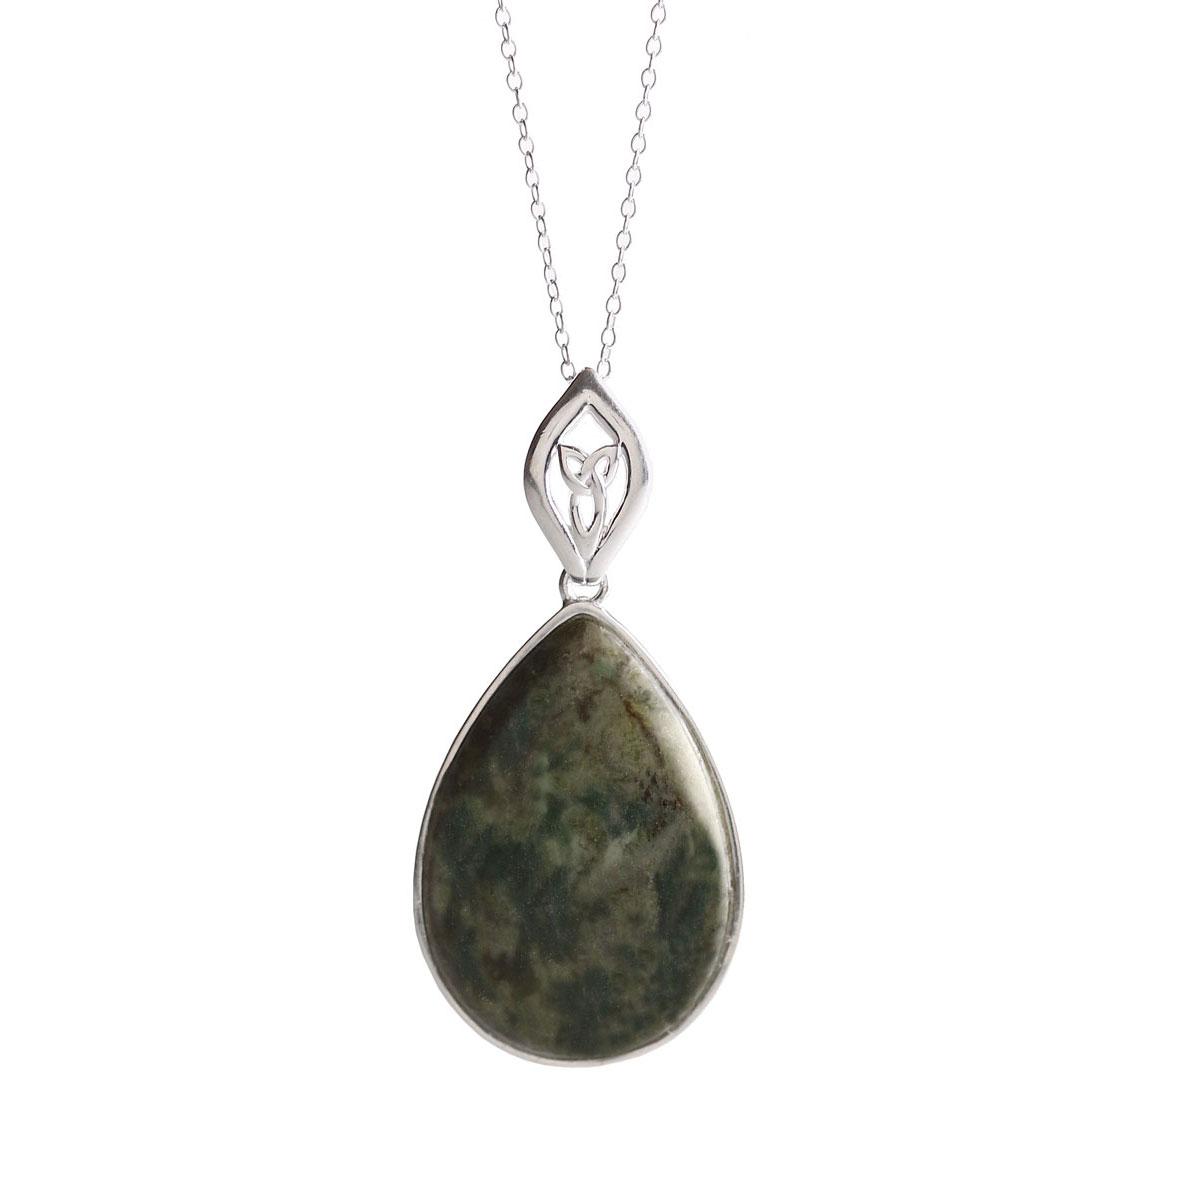 Cashs Ireland, Connemara Marble Trinity Drop Necklace